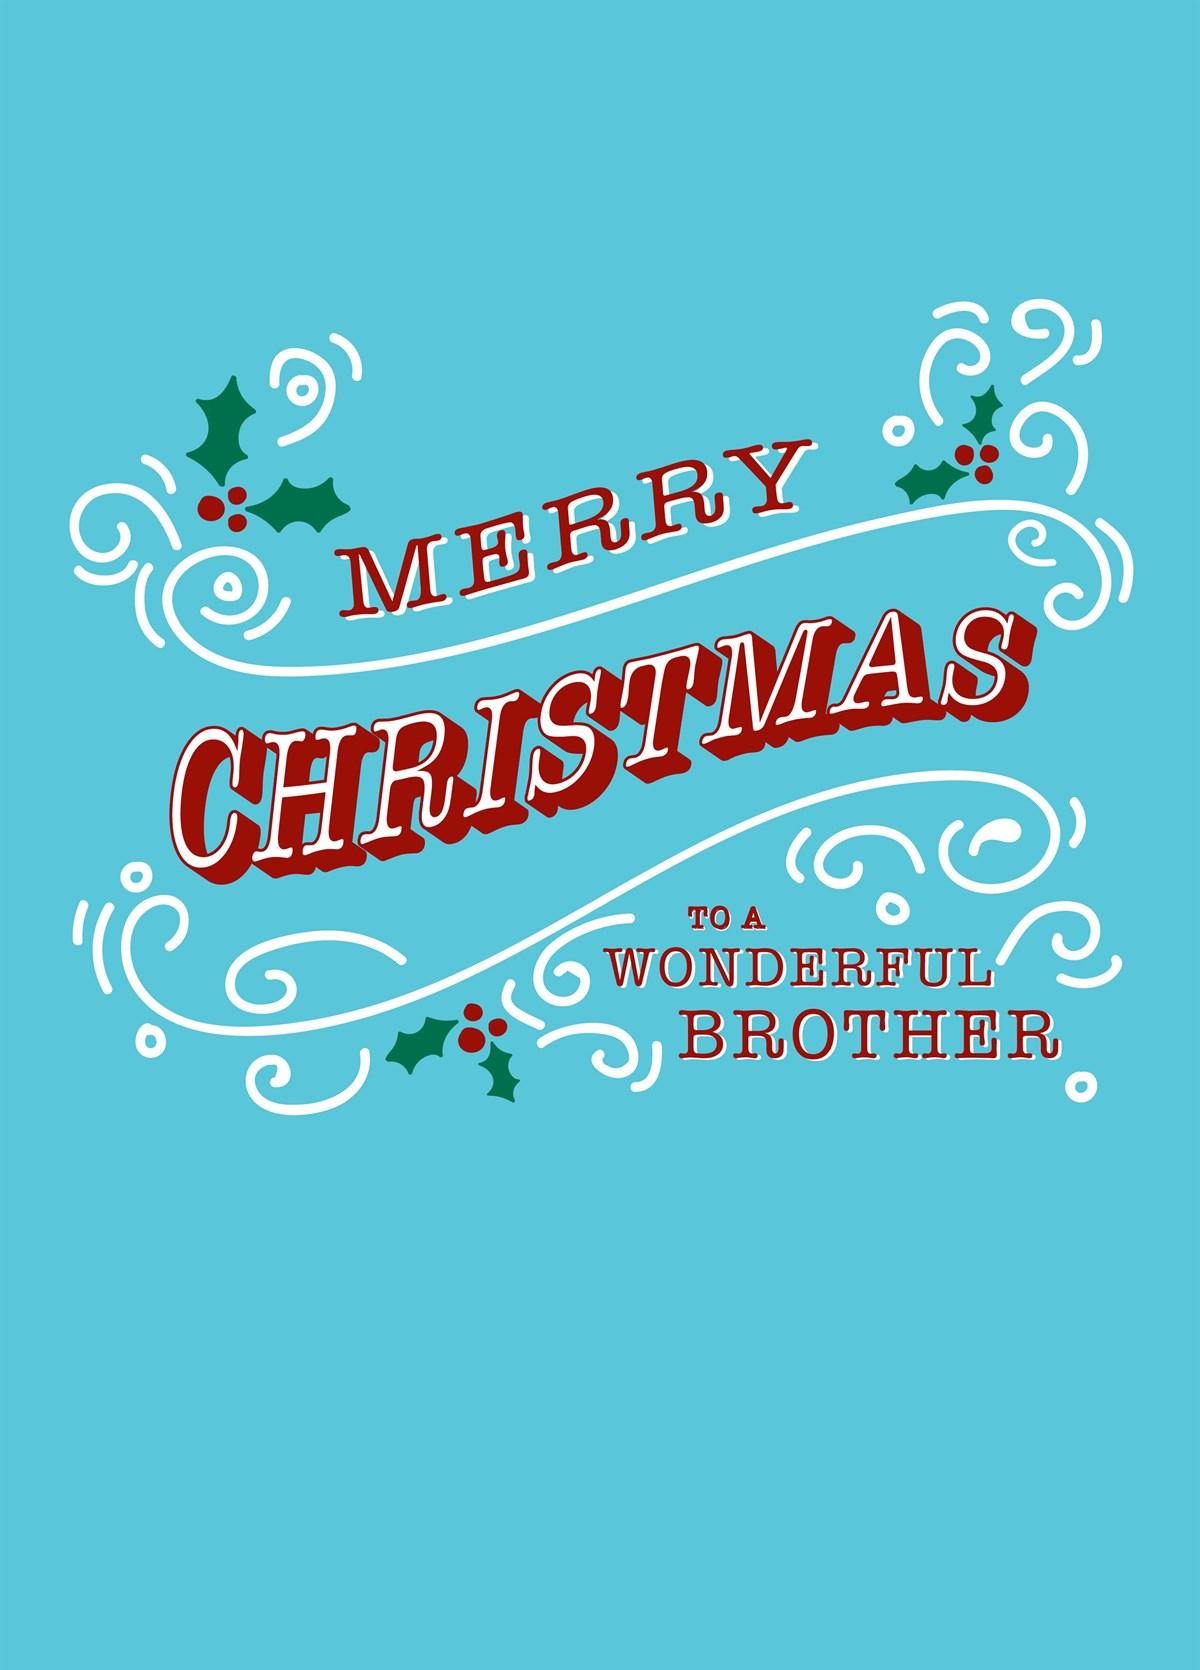 Merry Christmas Brother.Merry Christmas Brother